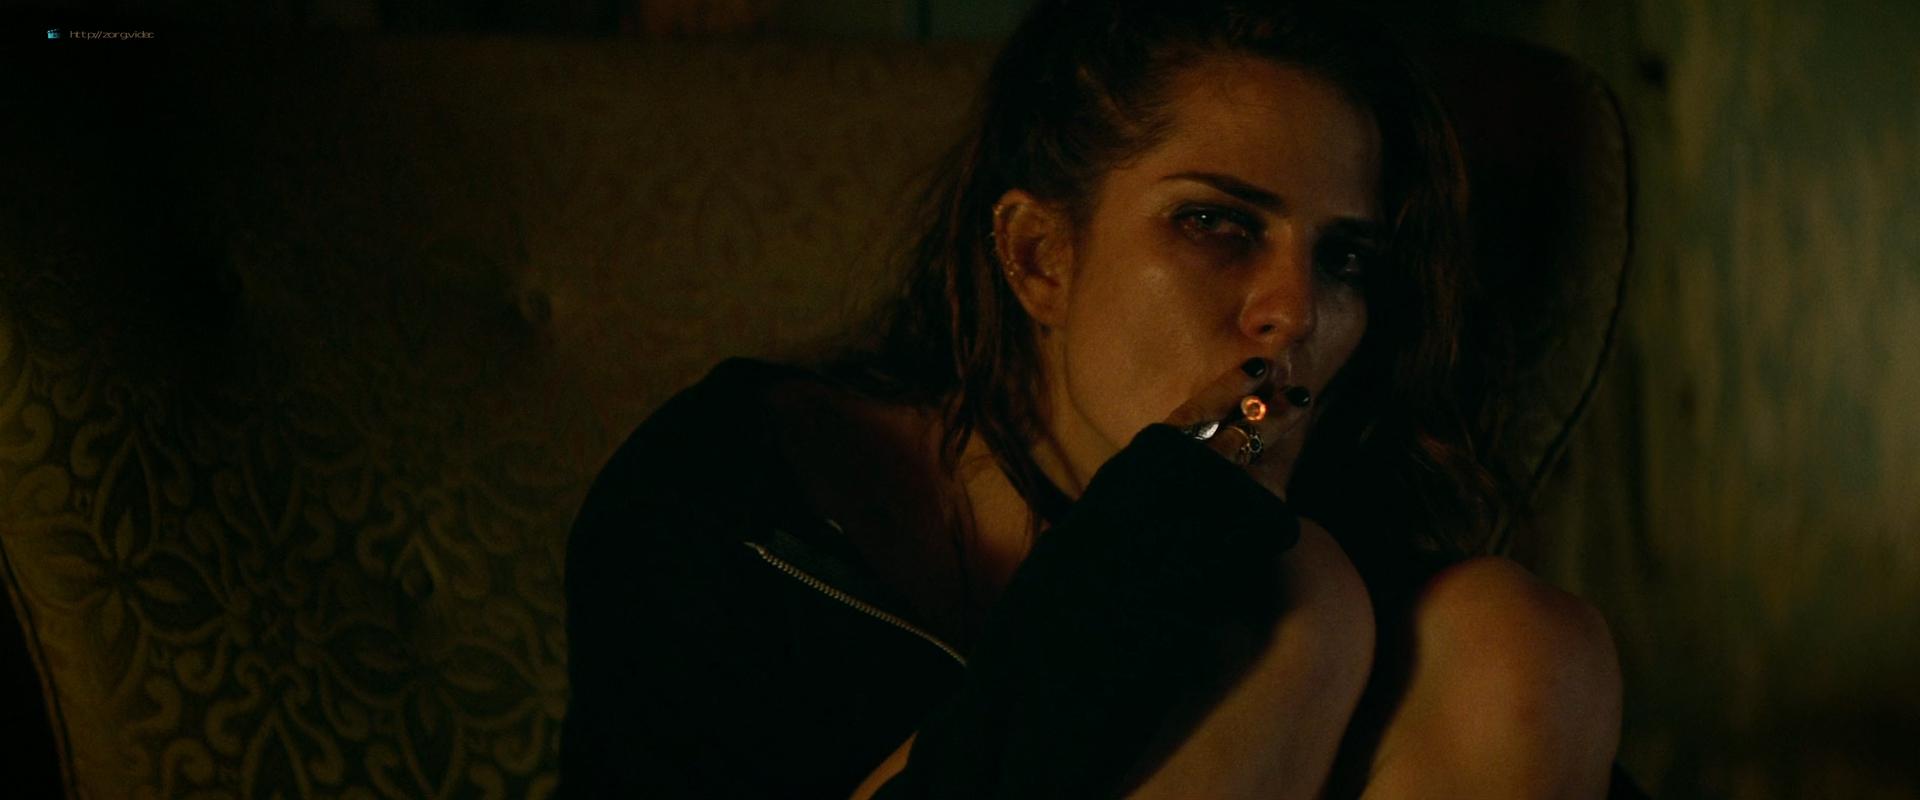 Karla Souza nude hot sex - Jacob's Ladder (2019) HD 1080p (2)